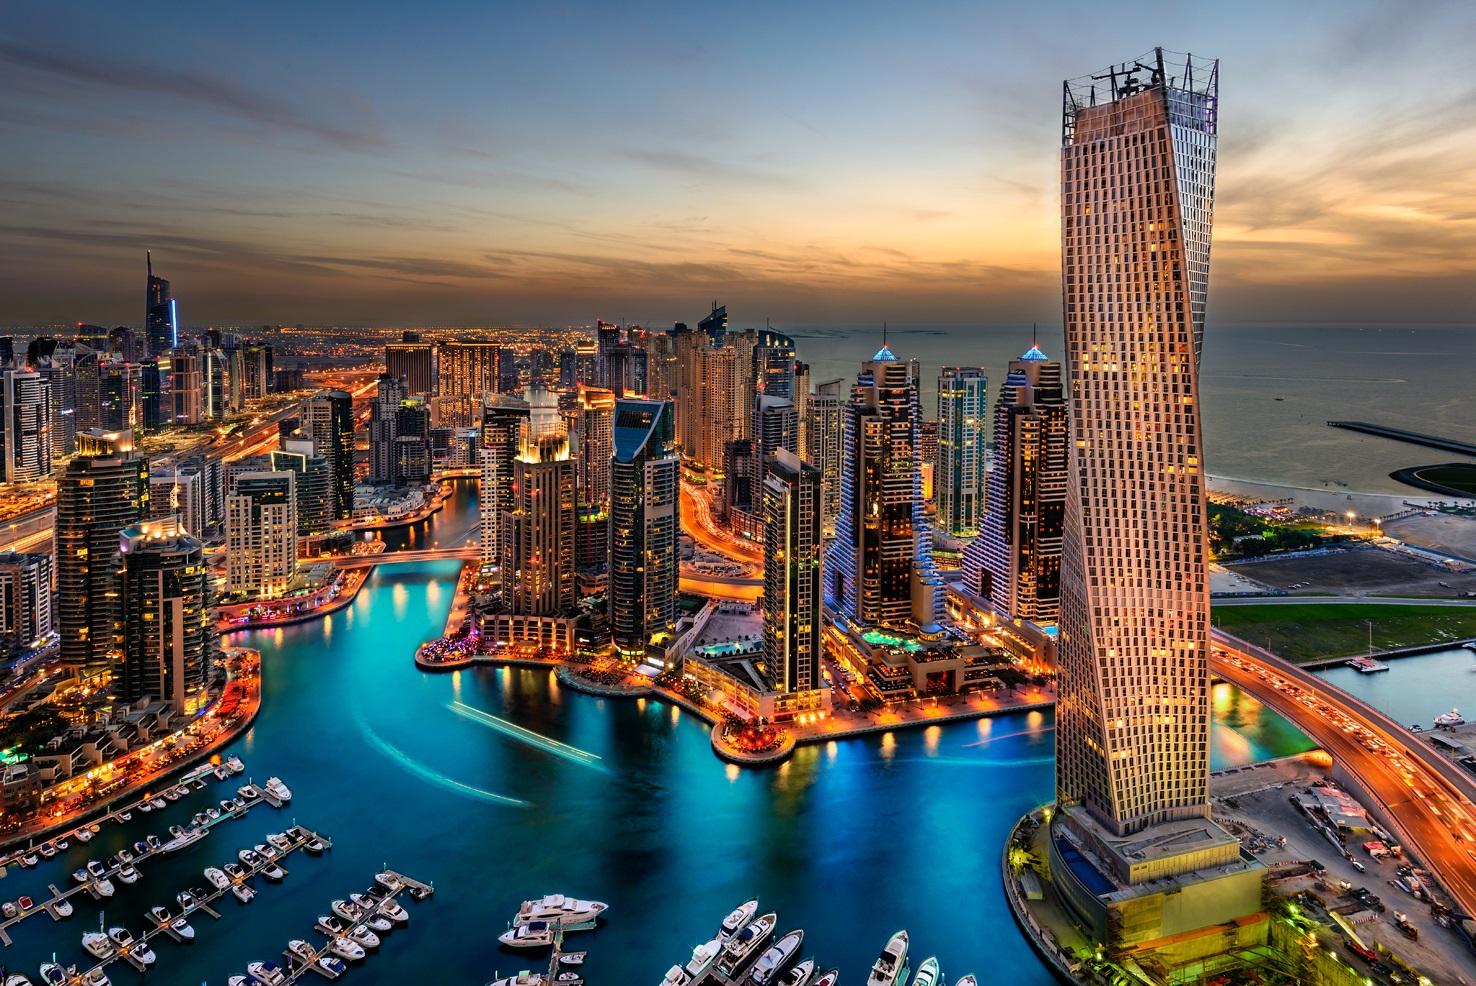 extravagantne-arabske-mesto (16)